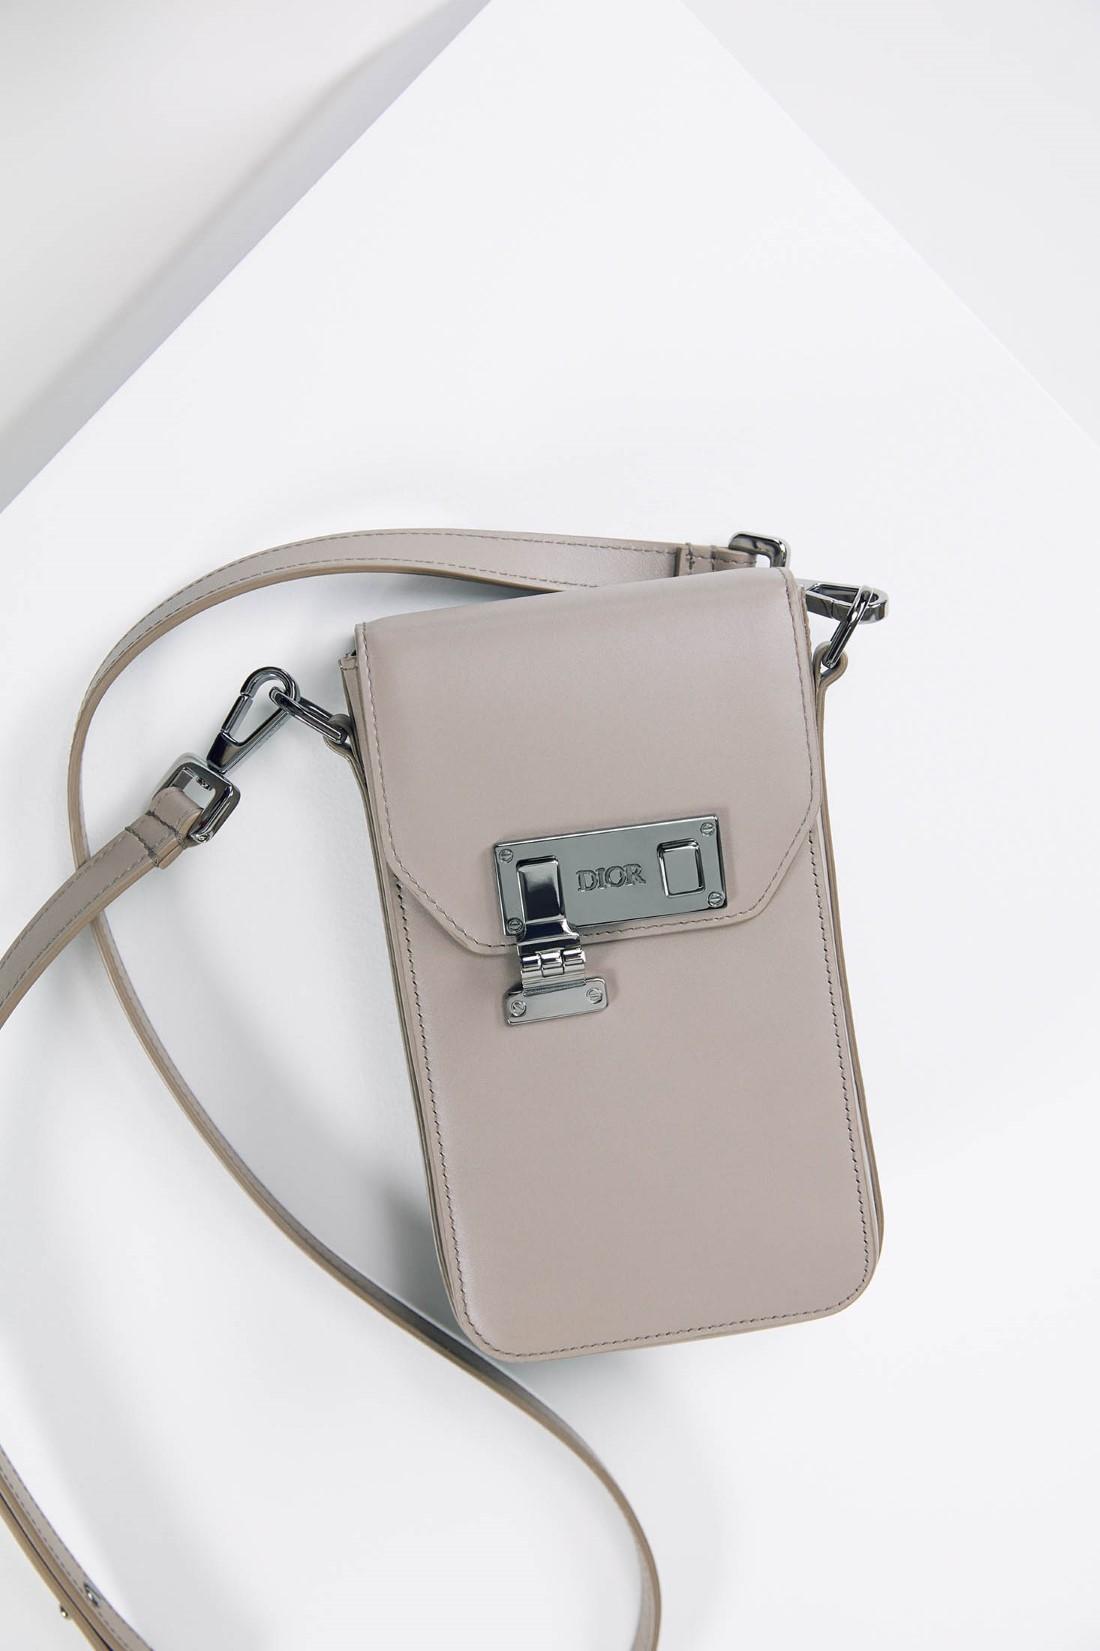 Dior Lock Bag - Dior Men